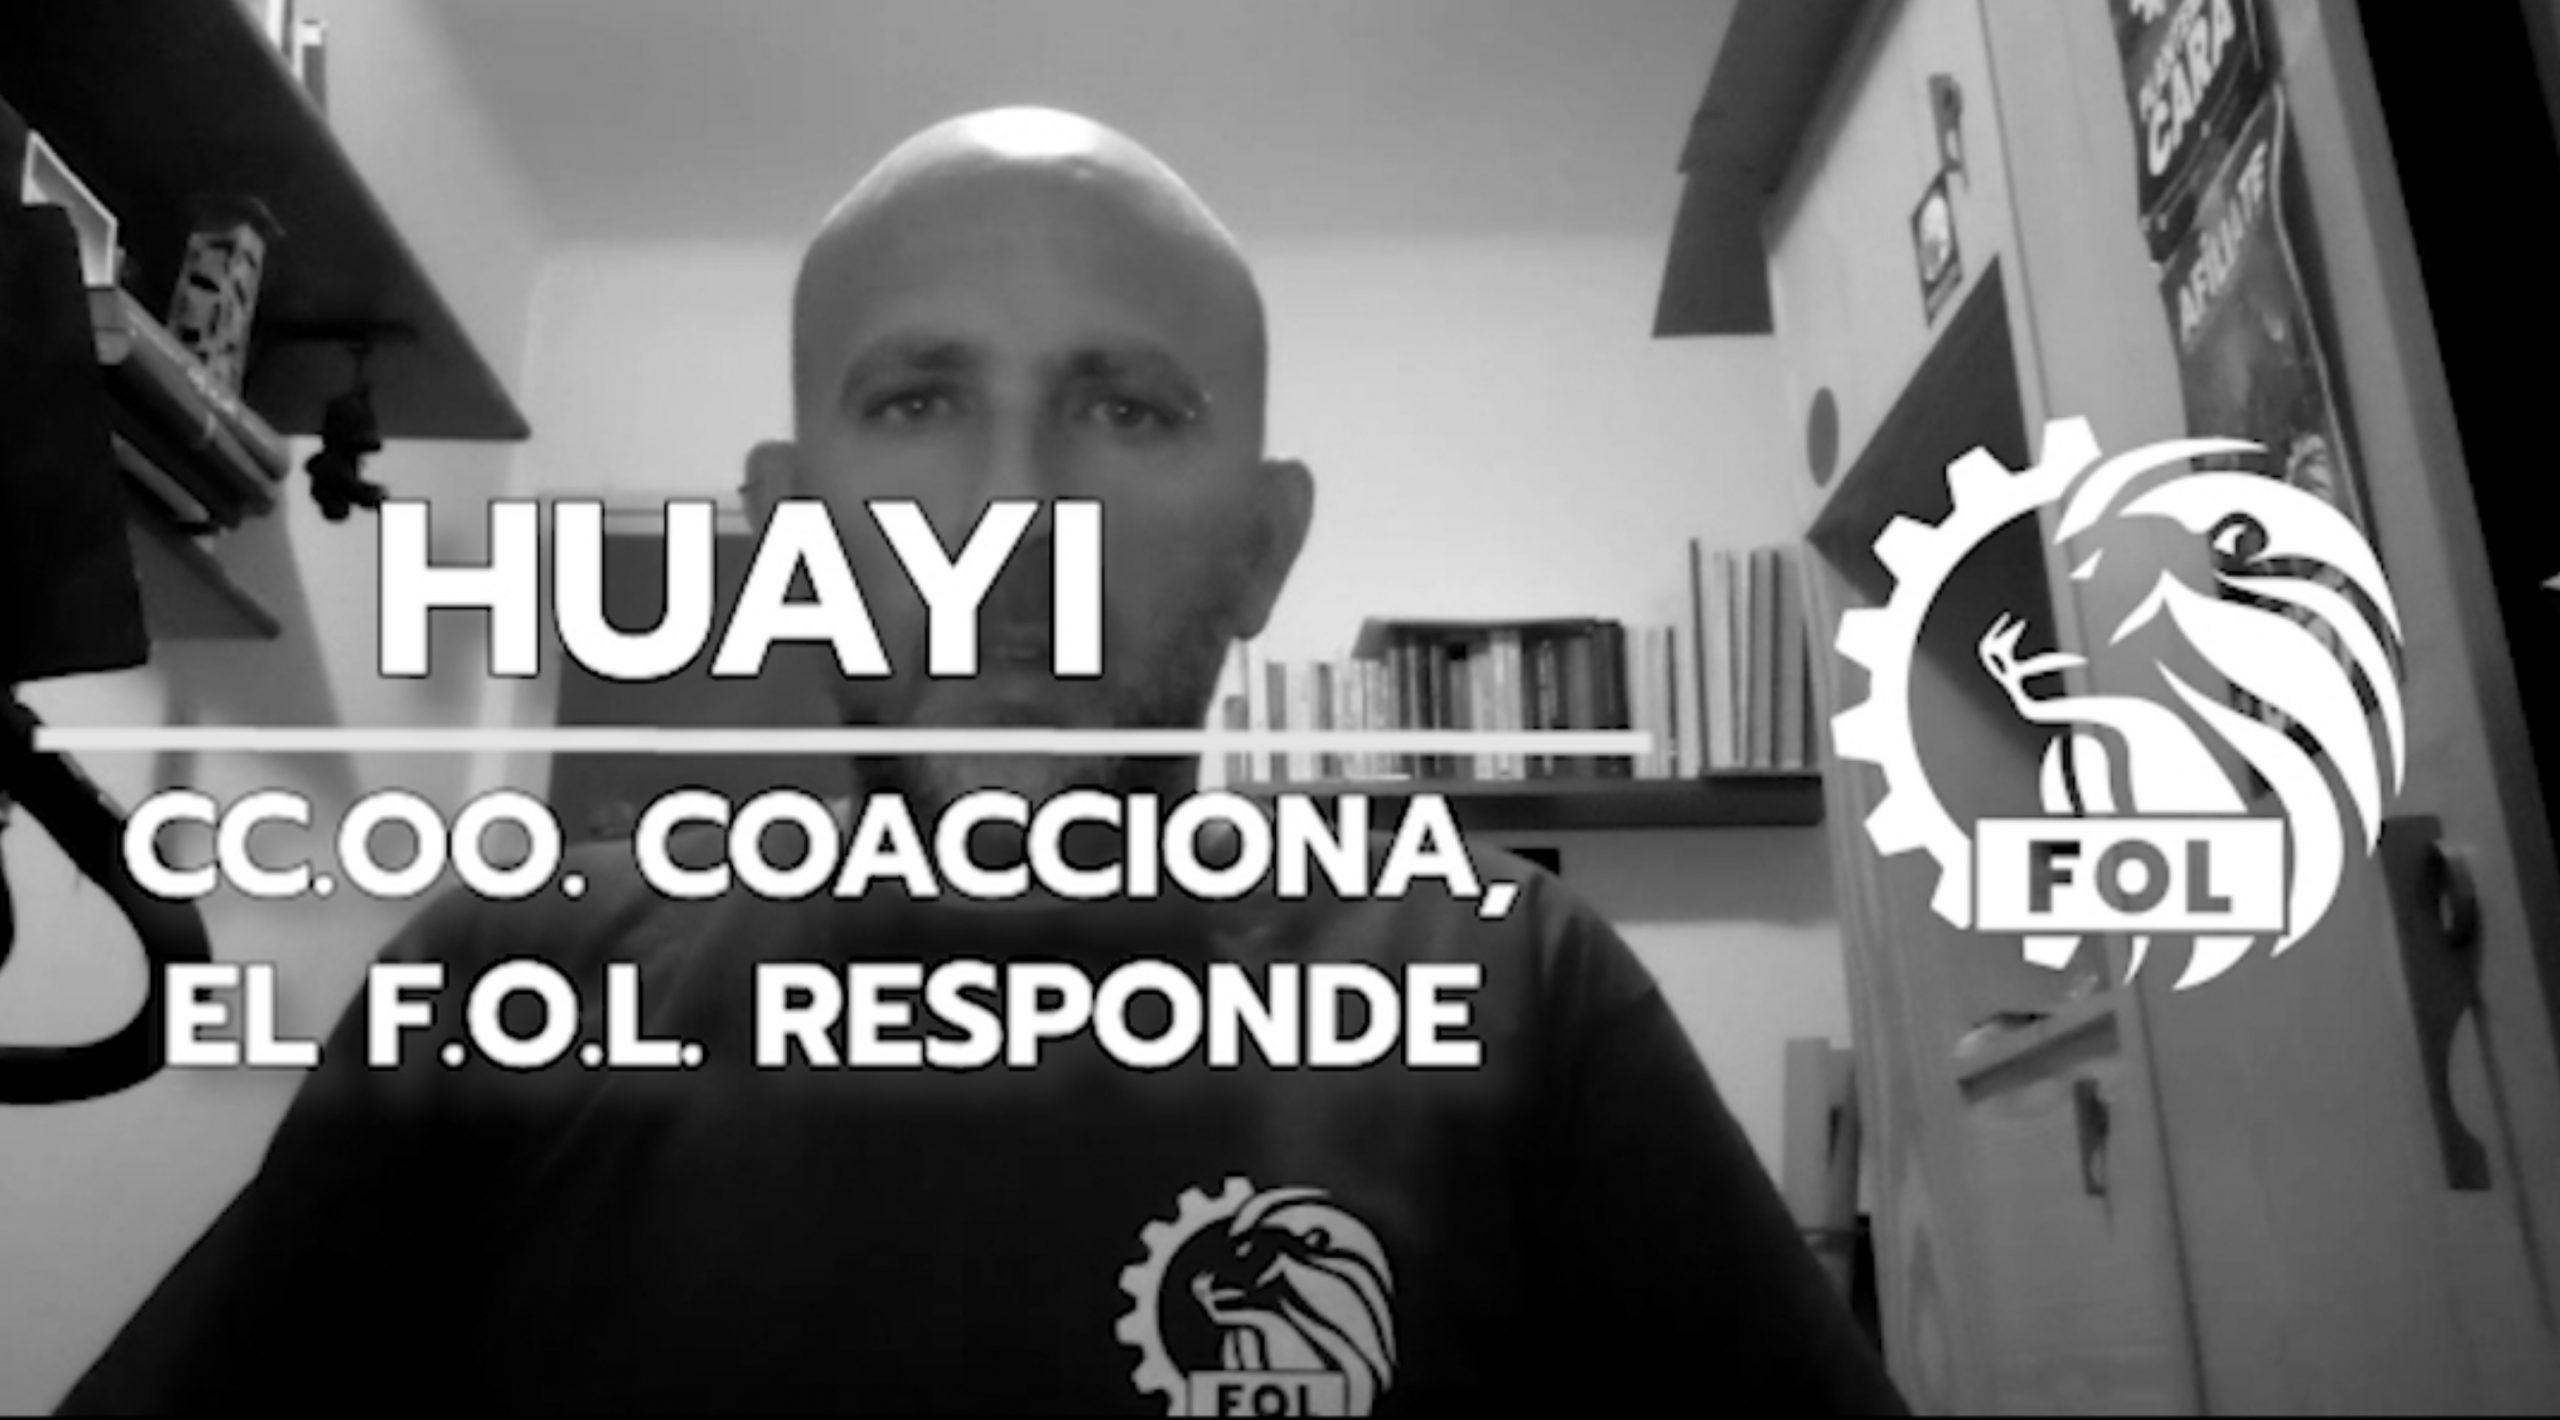 CCOO Coacciona, El FOL Responde